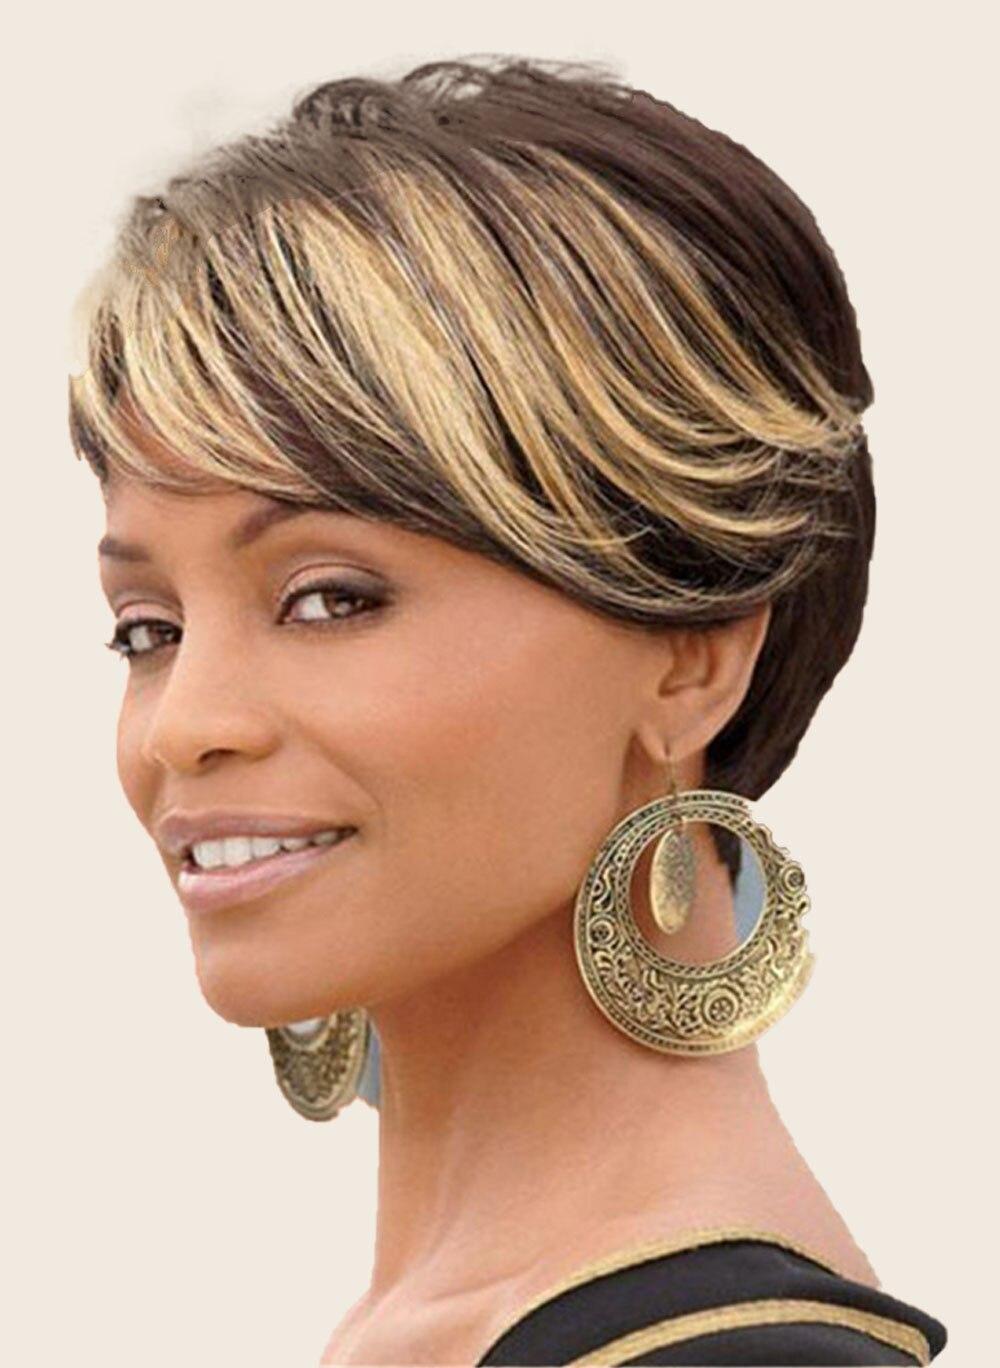 Lateral Para As Mulheres Negras Marrom Misturado Preto Festa Cosplay peruca